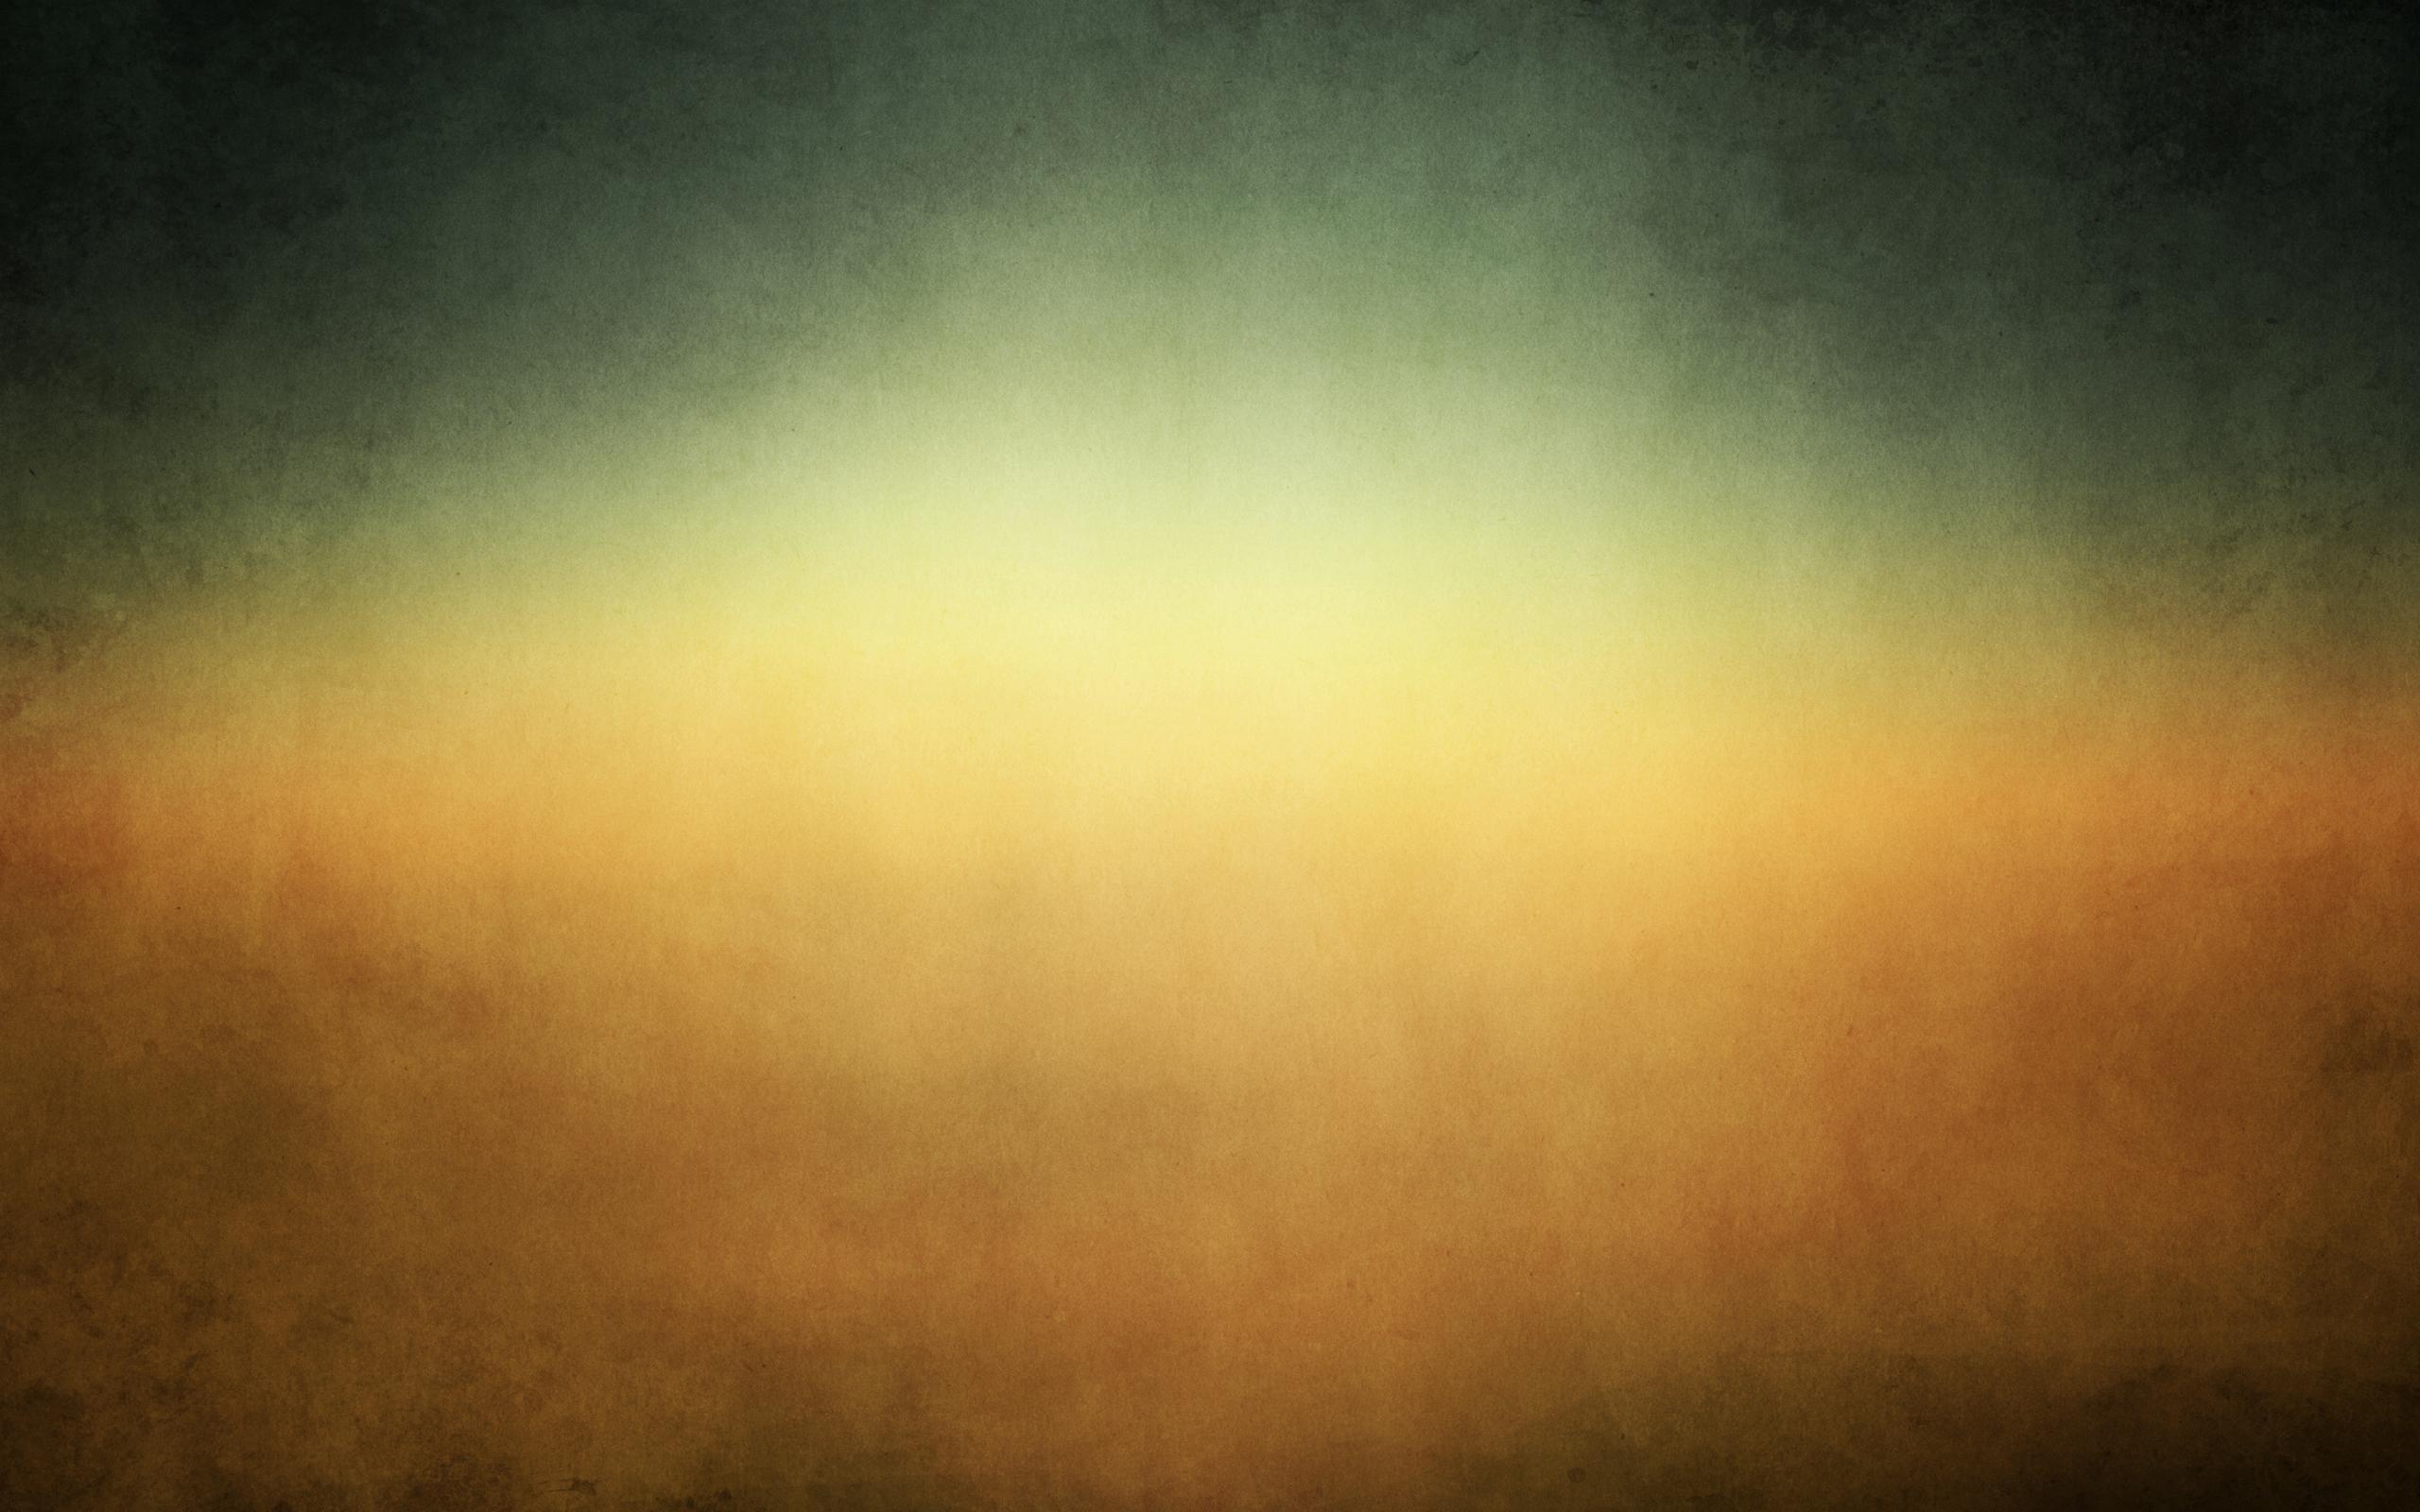 Pictures Gradient light dark background 2560x1600wallpapers 2560x1600